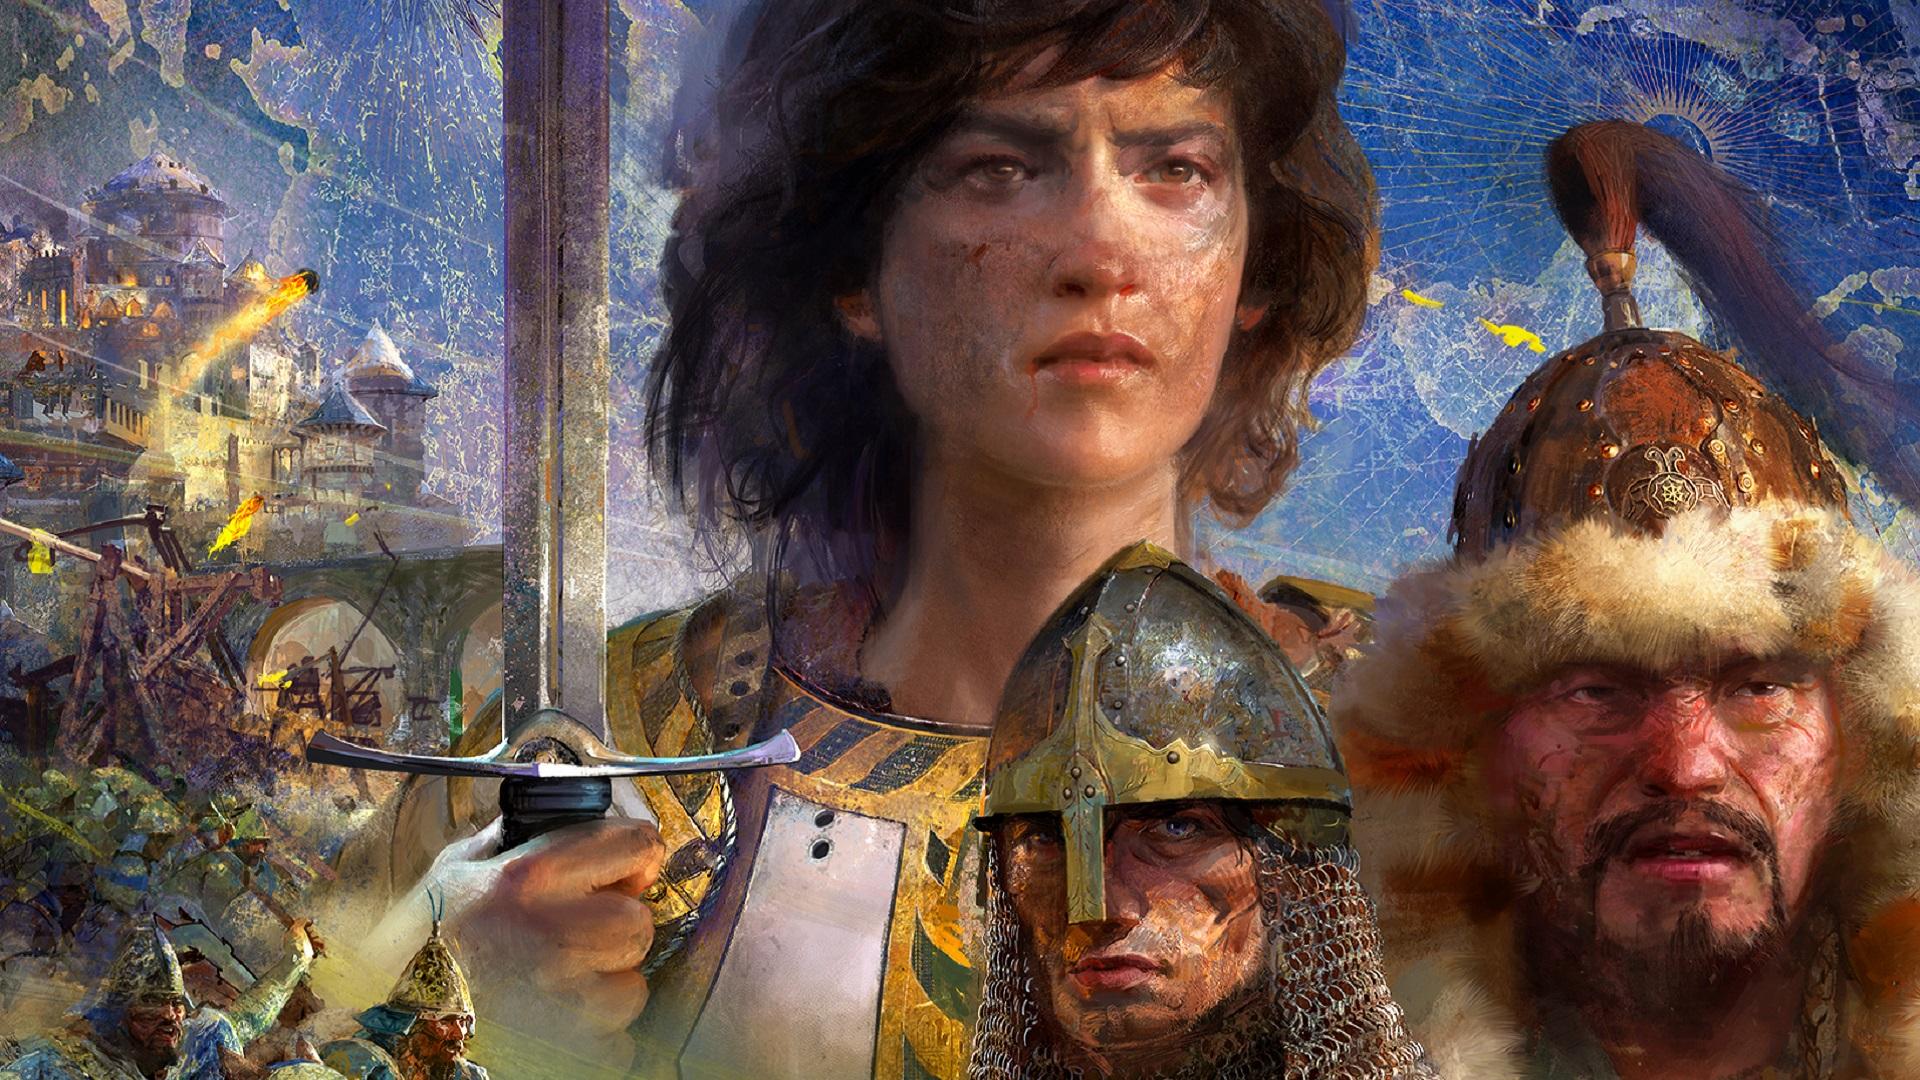 Powrót ukochanego klasyka. Recenzja Age of Empires IV